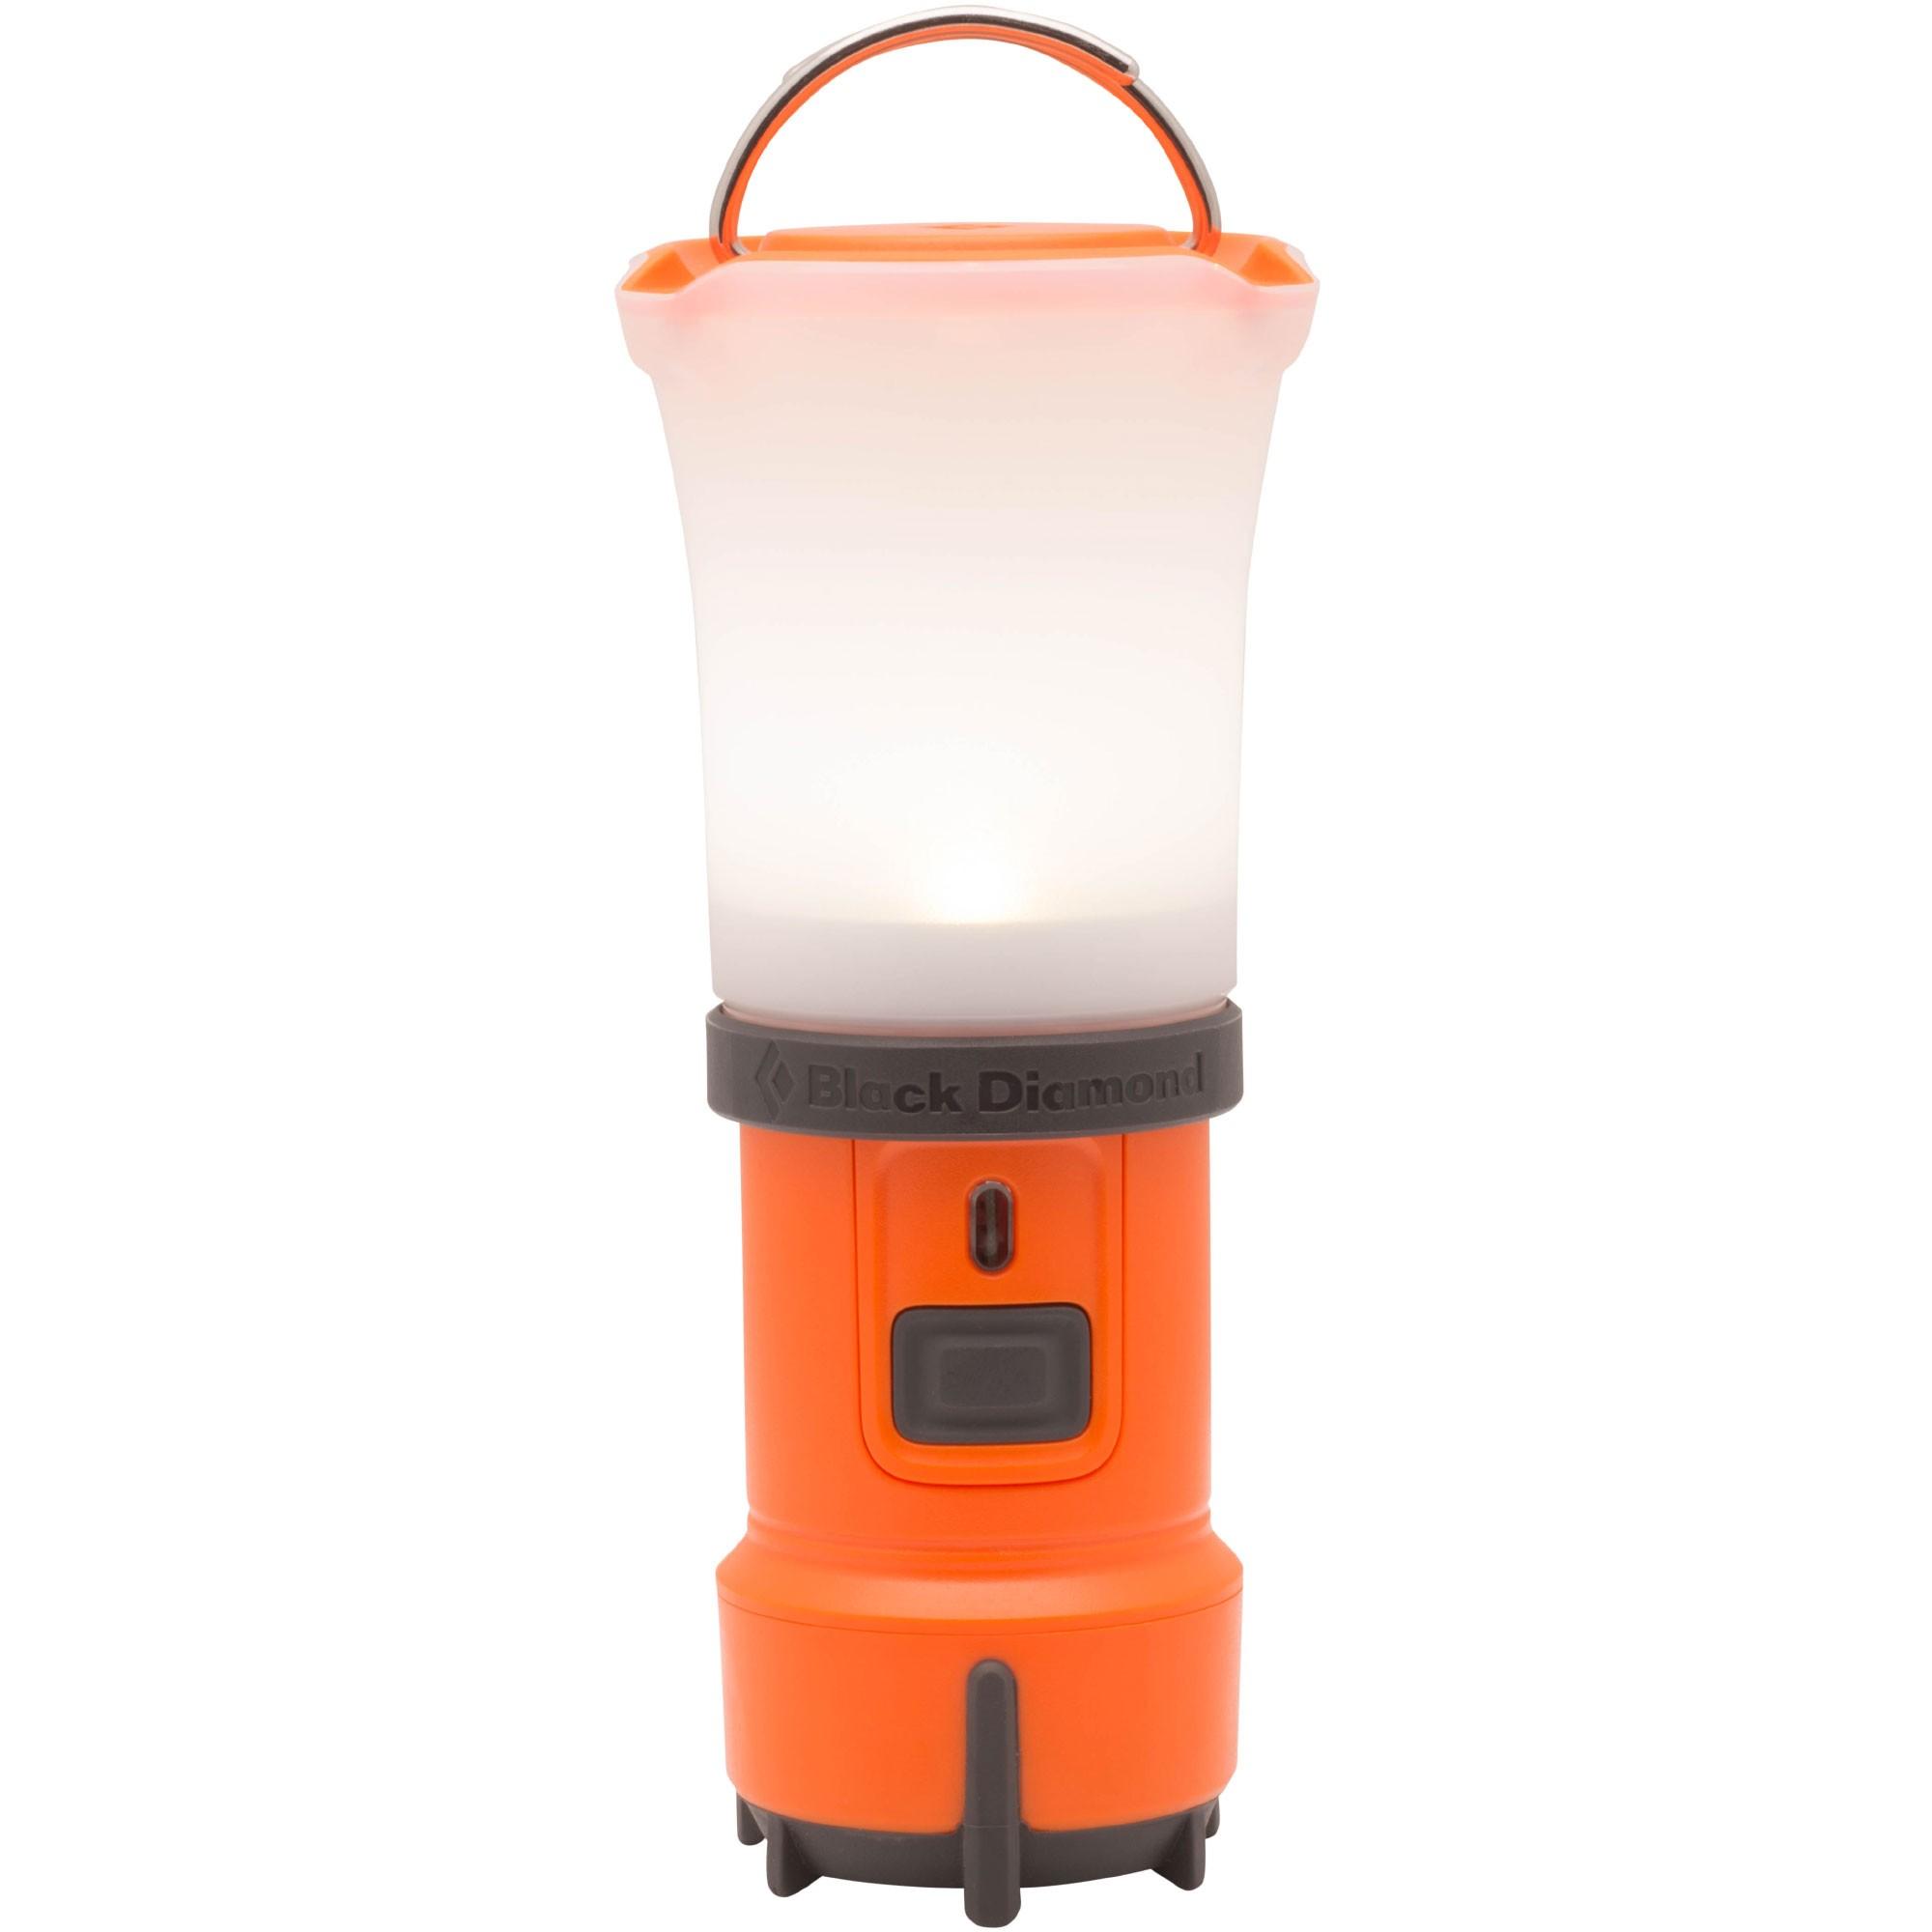 BLACK DIAMOND - Voyager Lantern Vibrant Orange